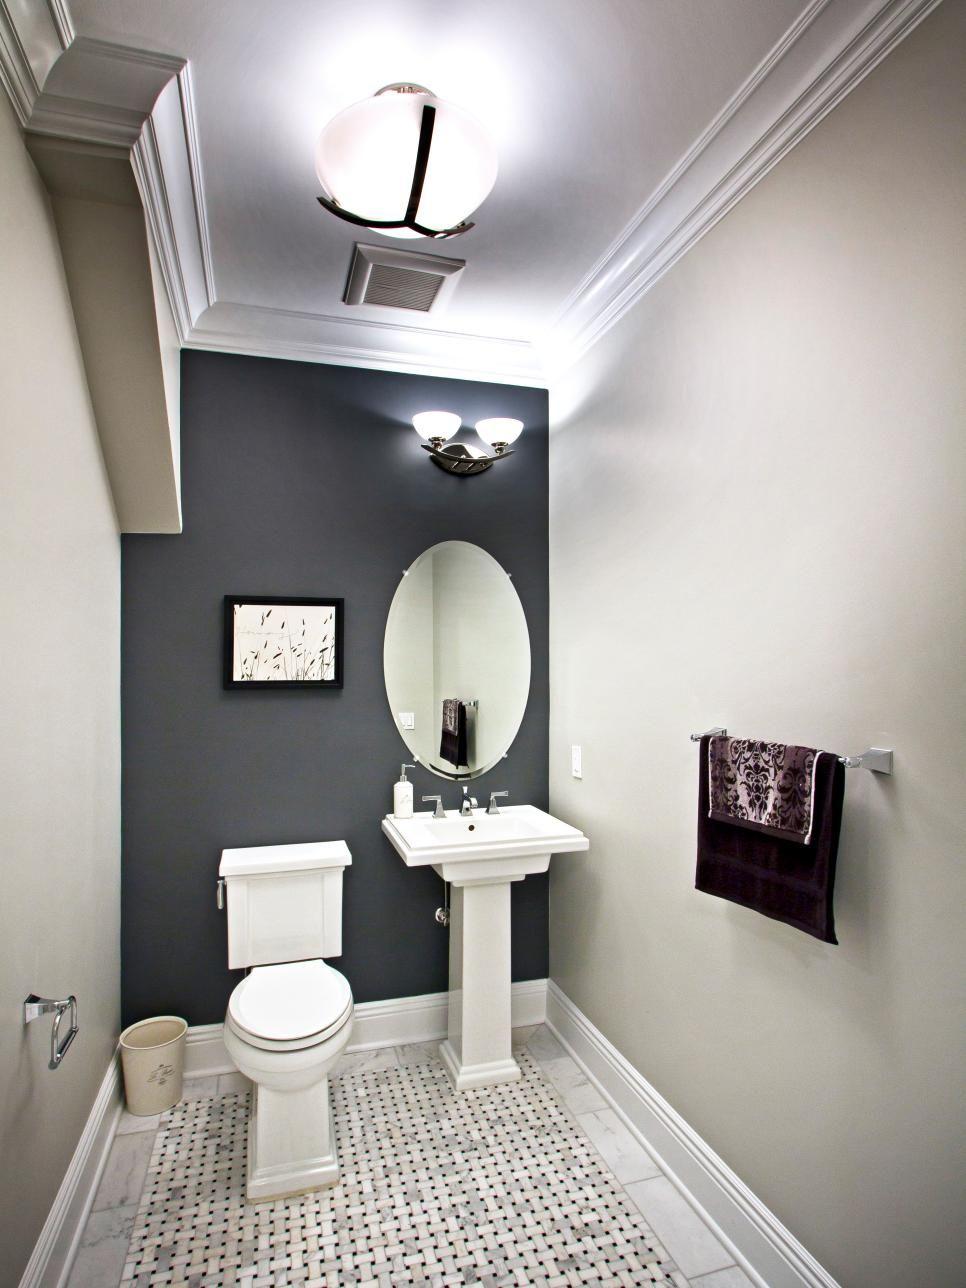 Rooms Viewer Best Bathroom Designs Bathroom Design Powder Room